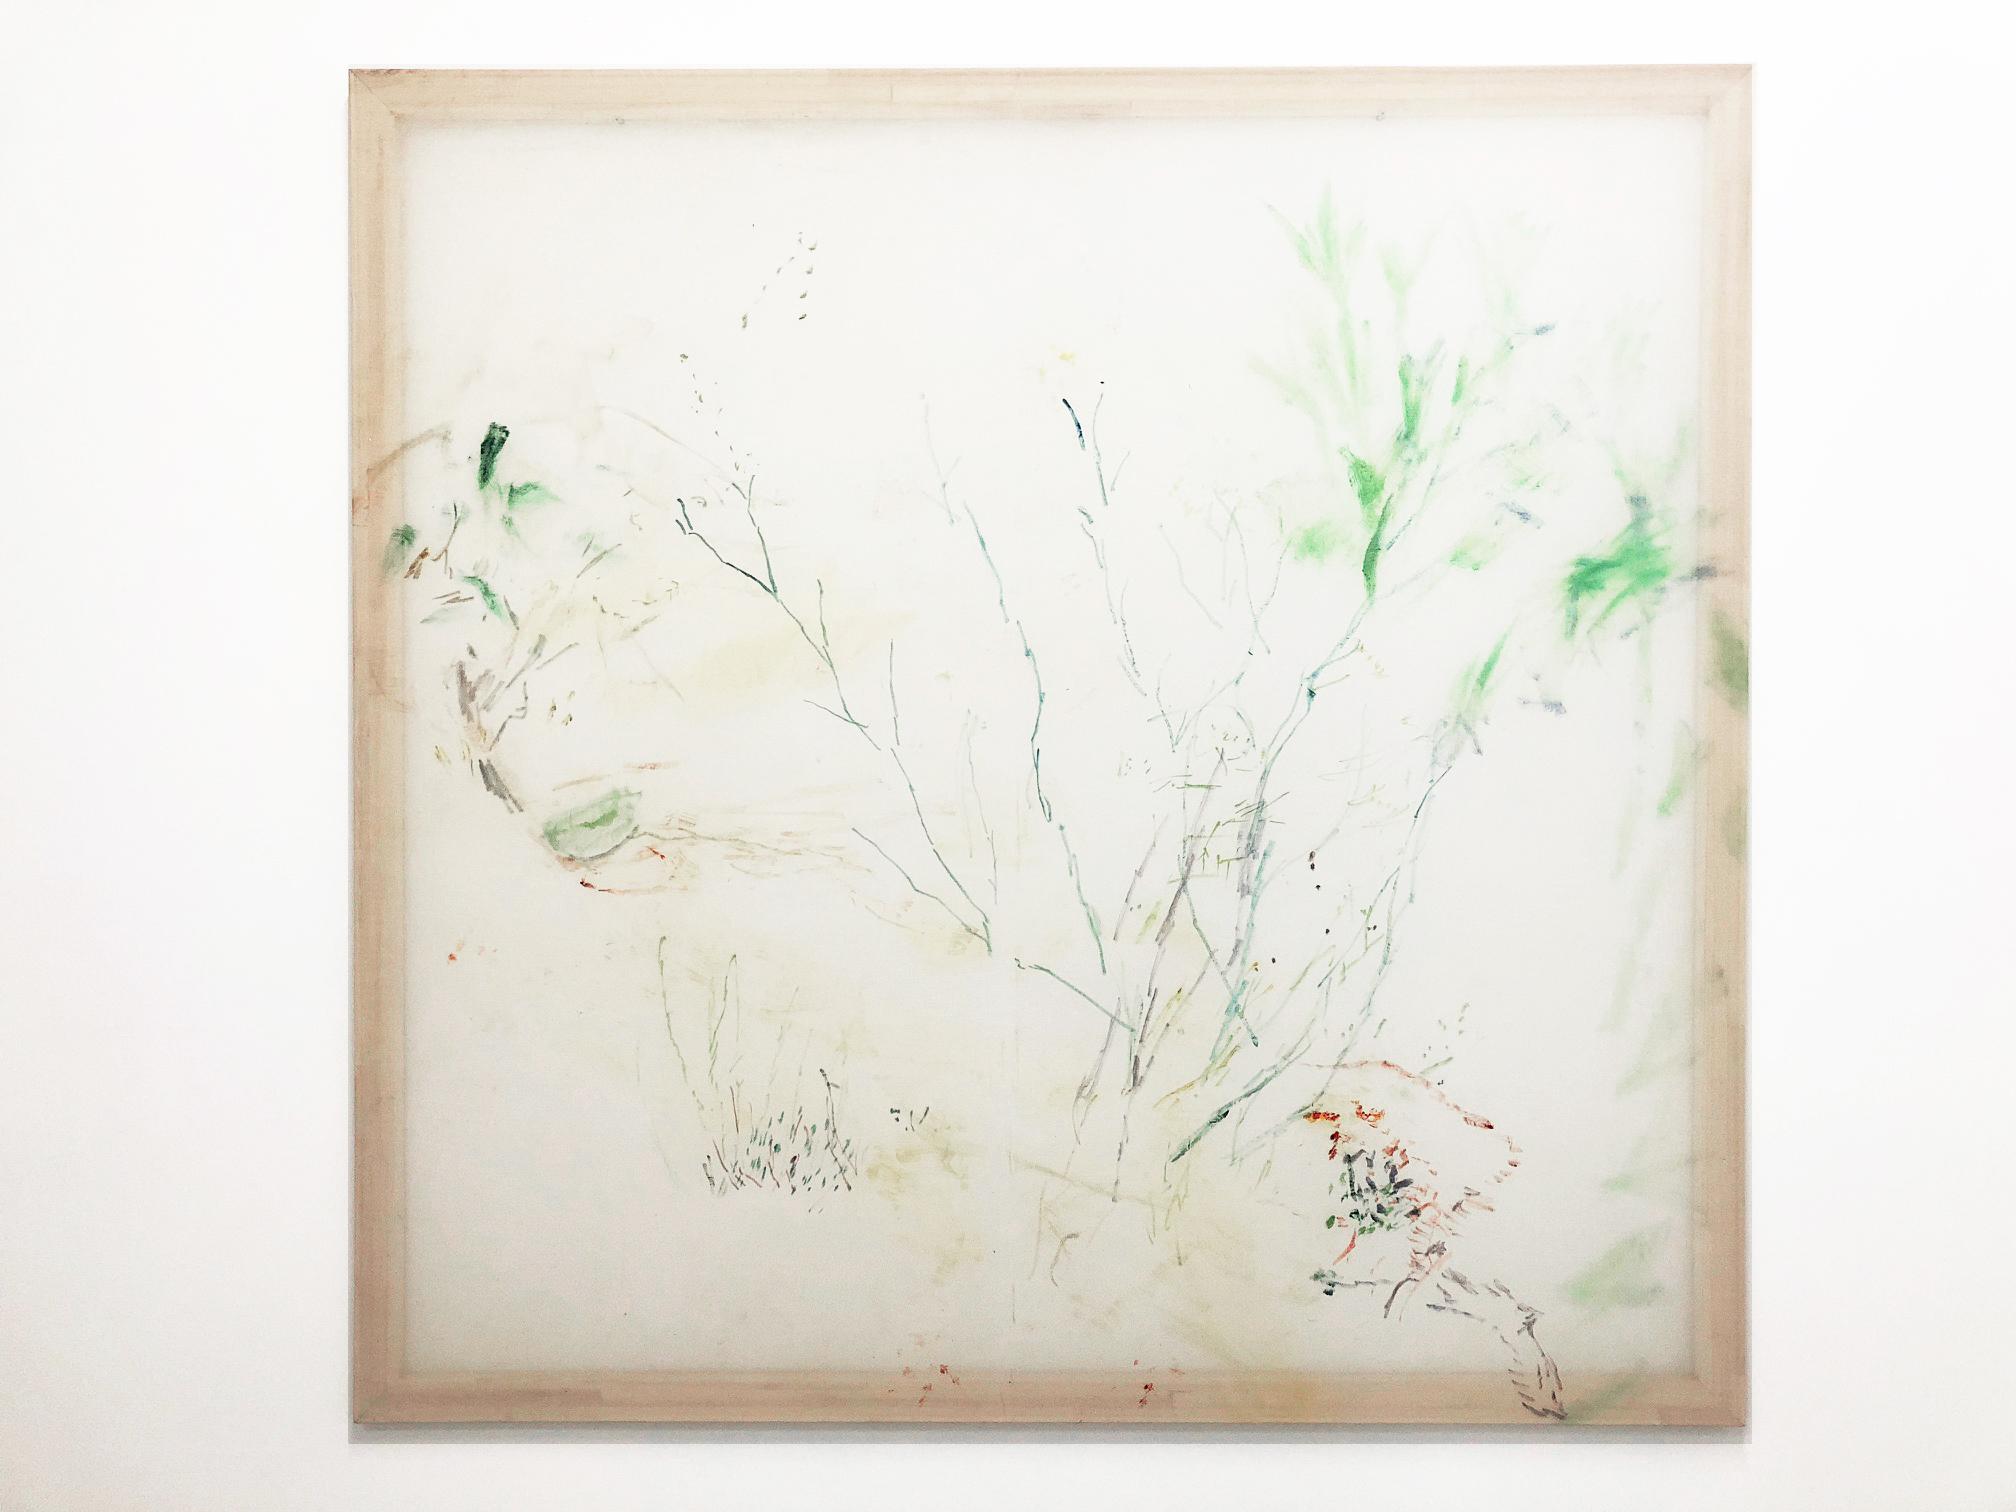 Jana Cordenier,  Untitled, 2018, oil on canvas, 170 x 175 cm